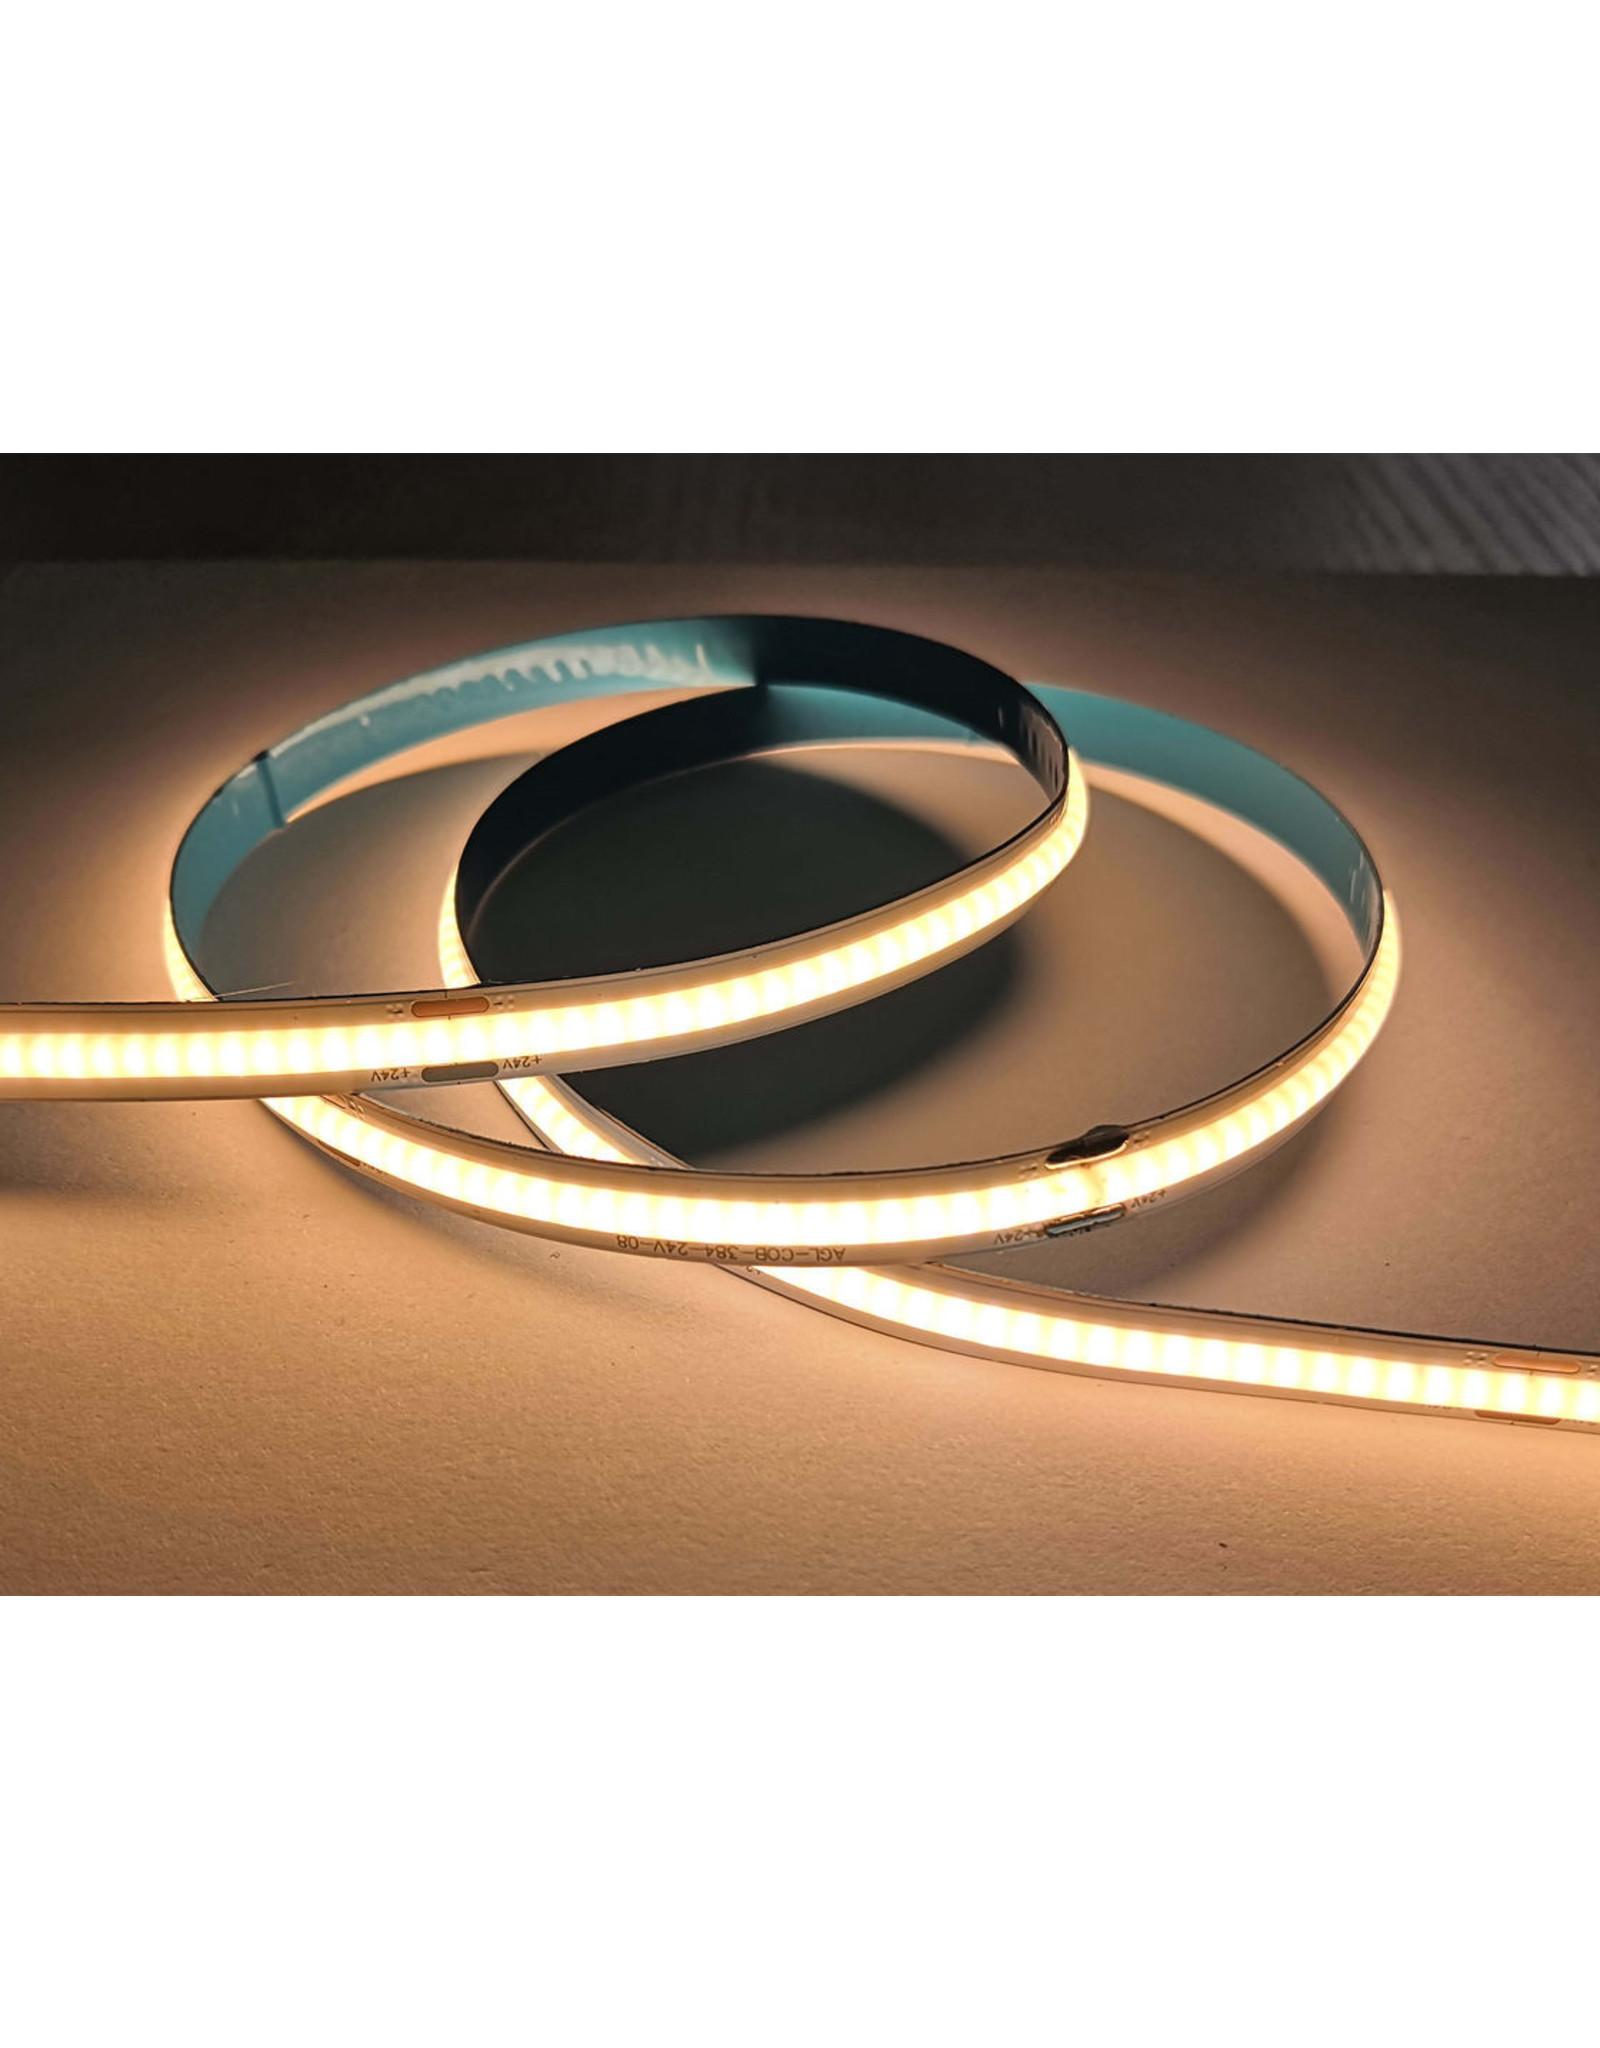 Lights COB Ledstrip 24v, 70w/5m, warm white 3000k - 1400LM - cri = 80